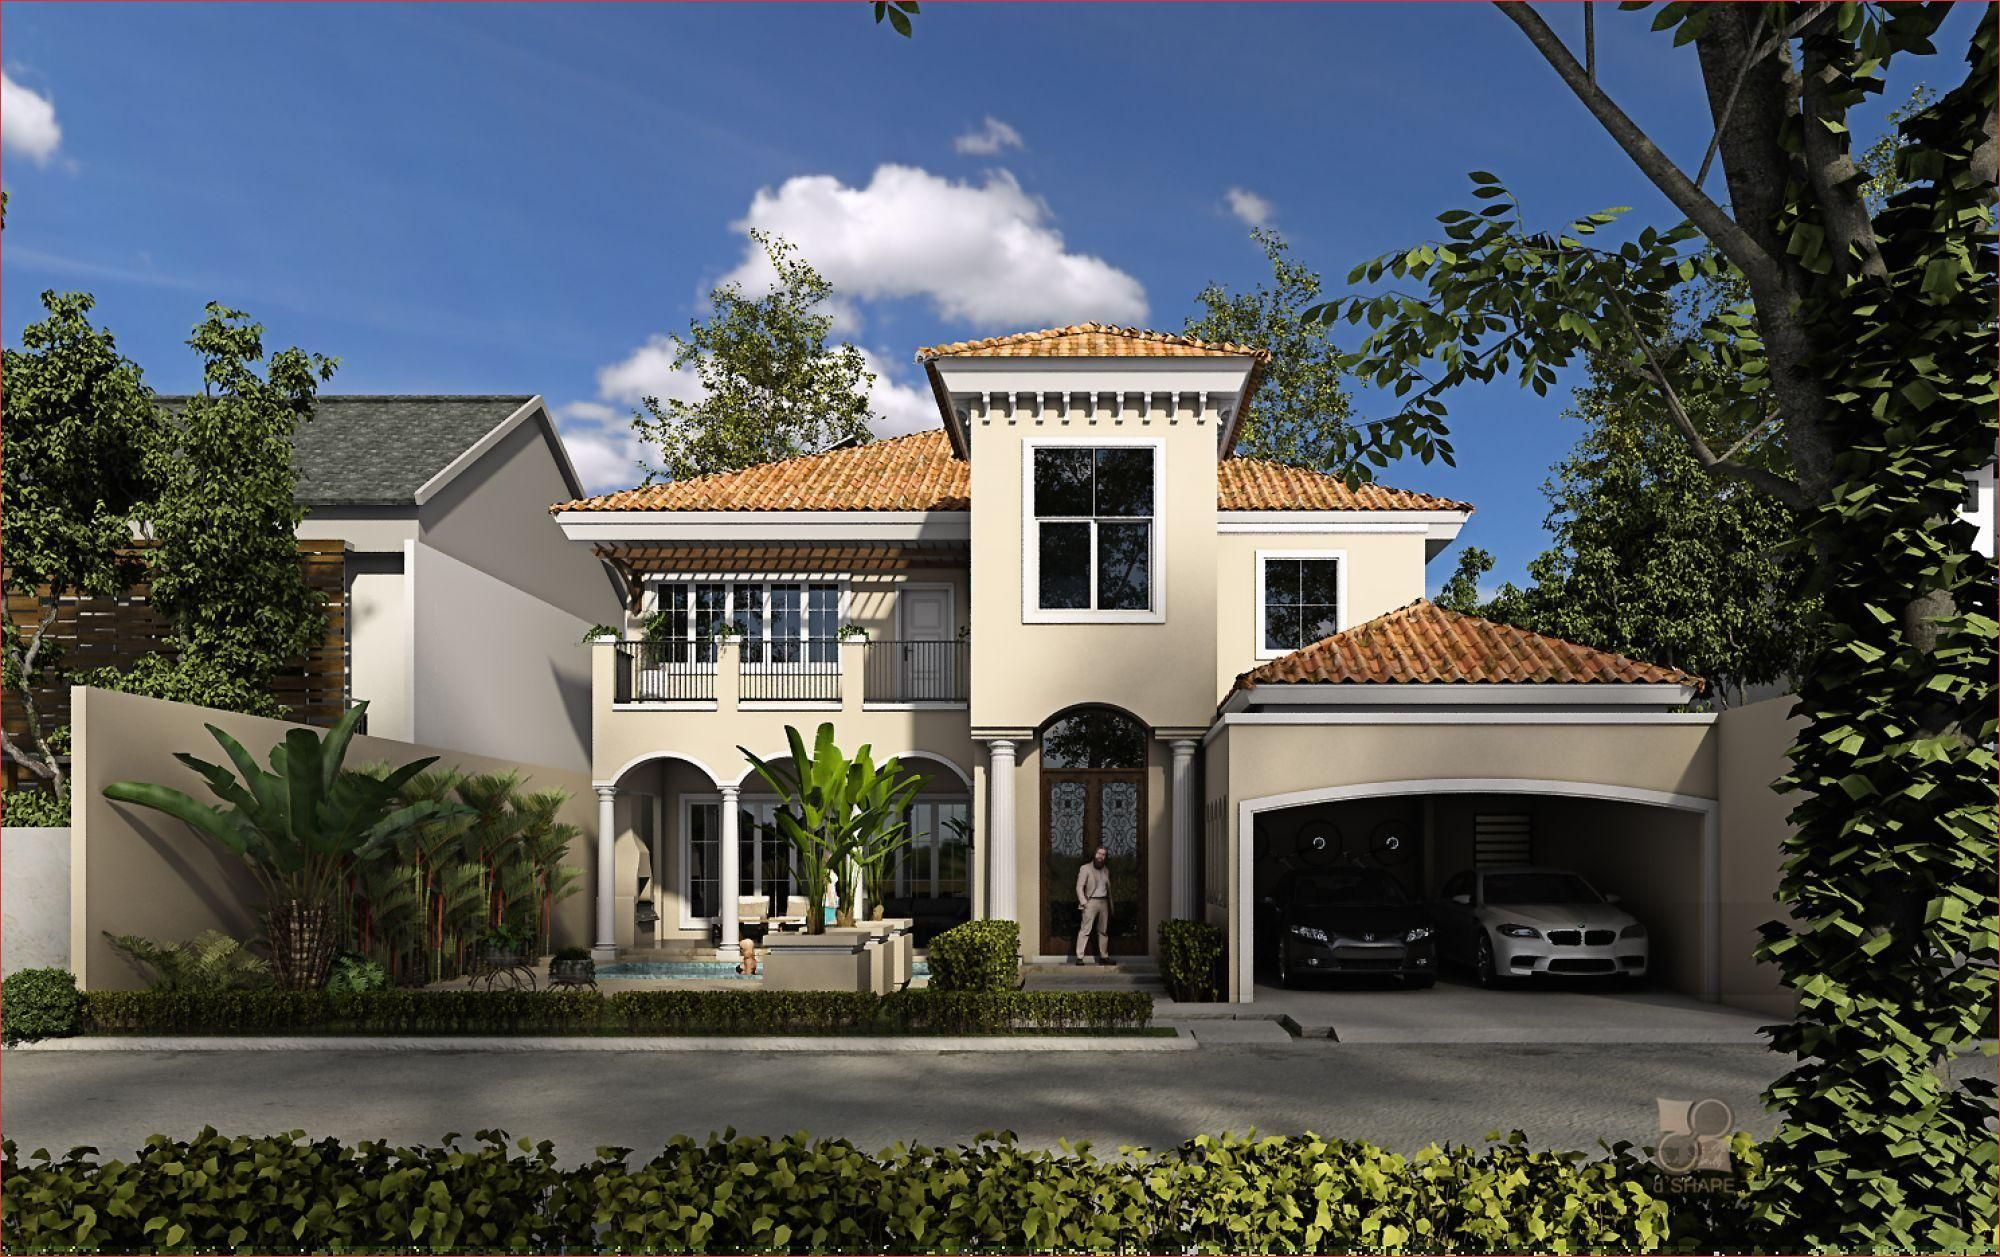 Modern mediterranean homes inspirational modern mediterranean homes modern interior house colours australia popular paint